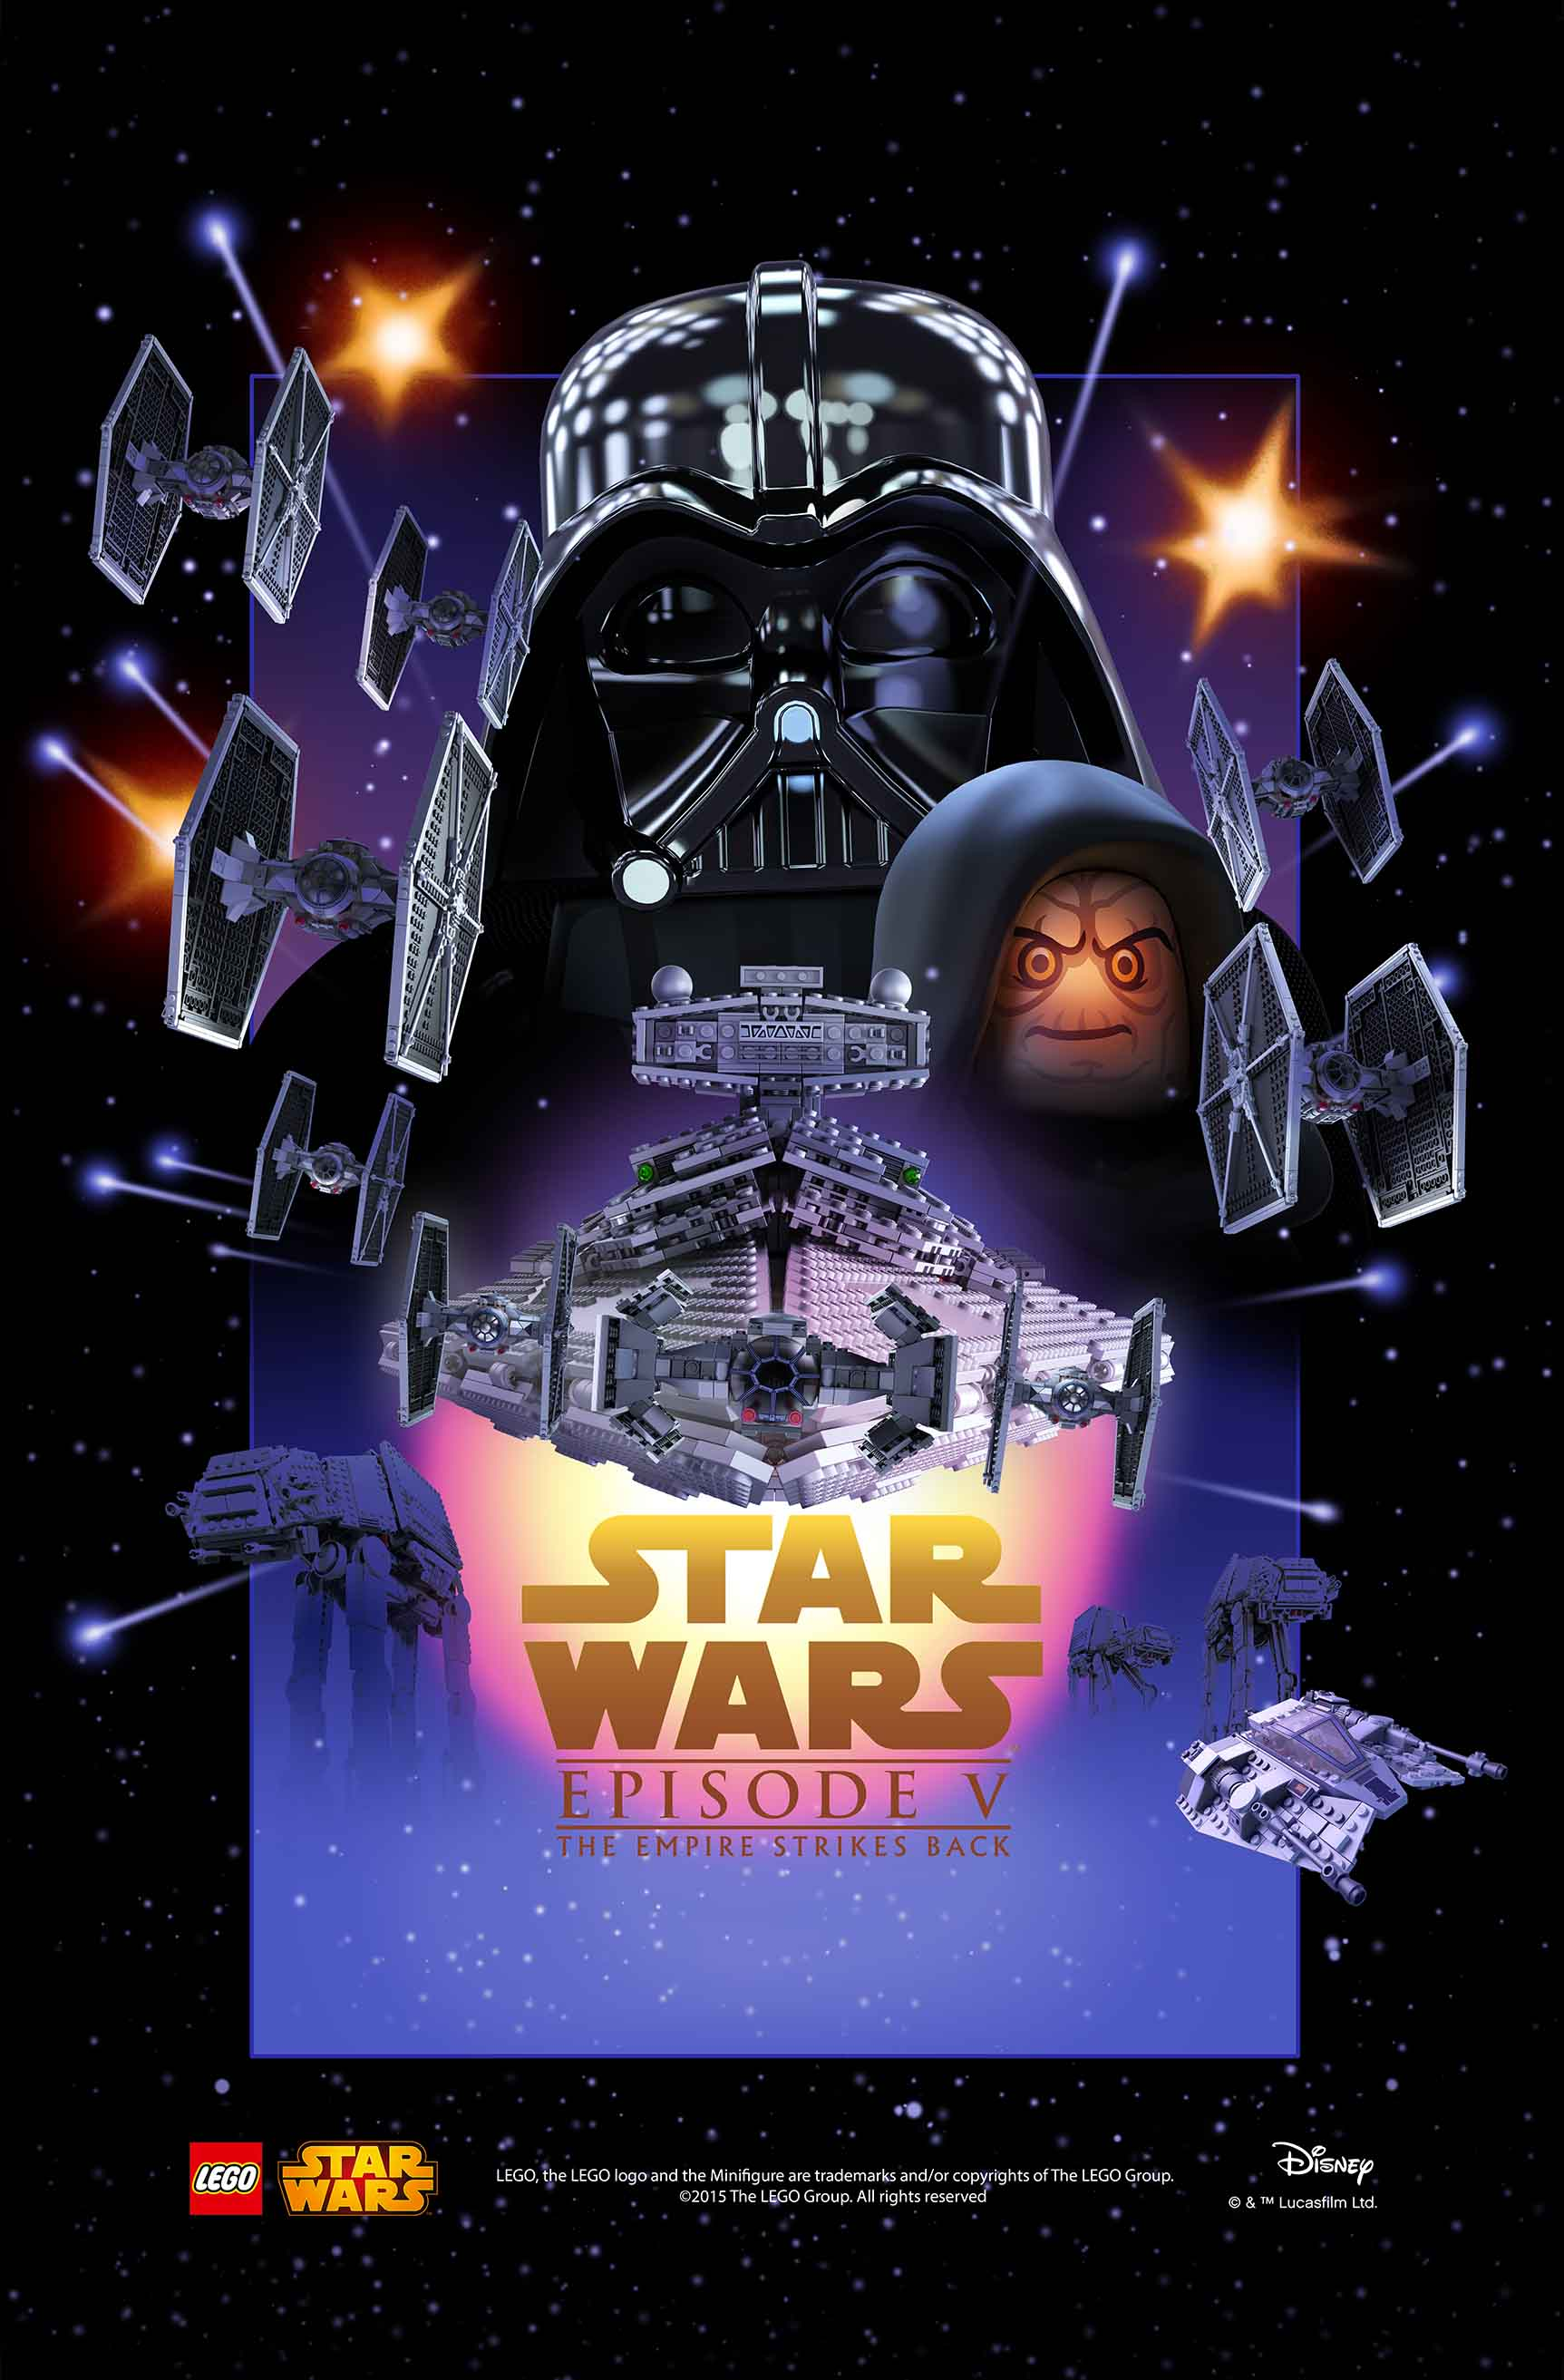 Star wars lego movie postersreggie 39 s - Image star wars lego ...